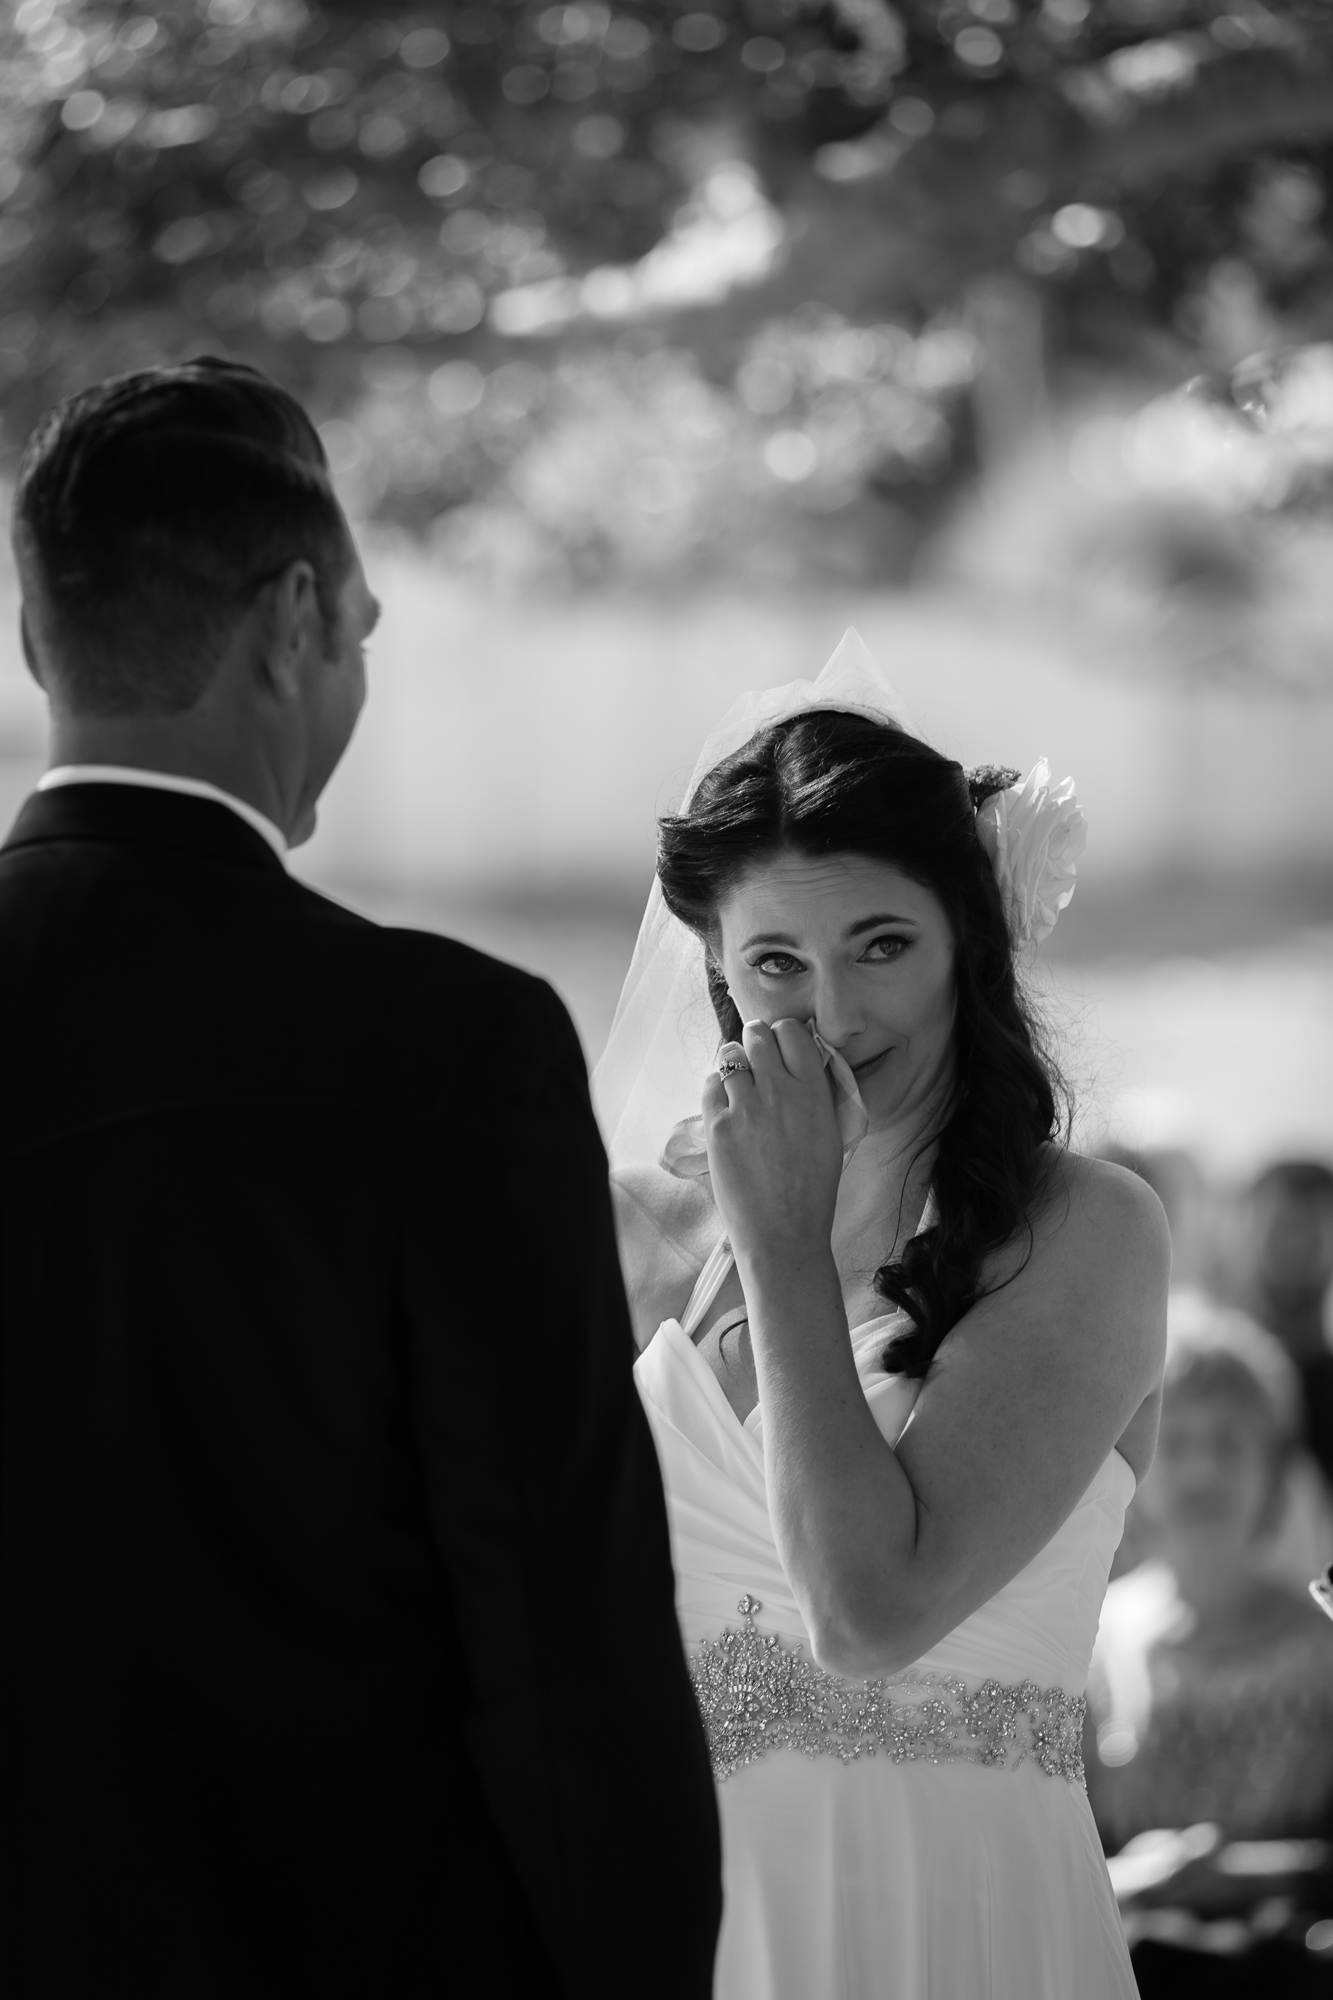 Gary-Kasl-SandKasl-Imaging-Wedding-Photography-27.jpg